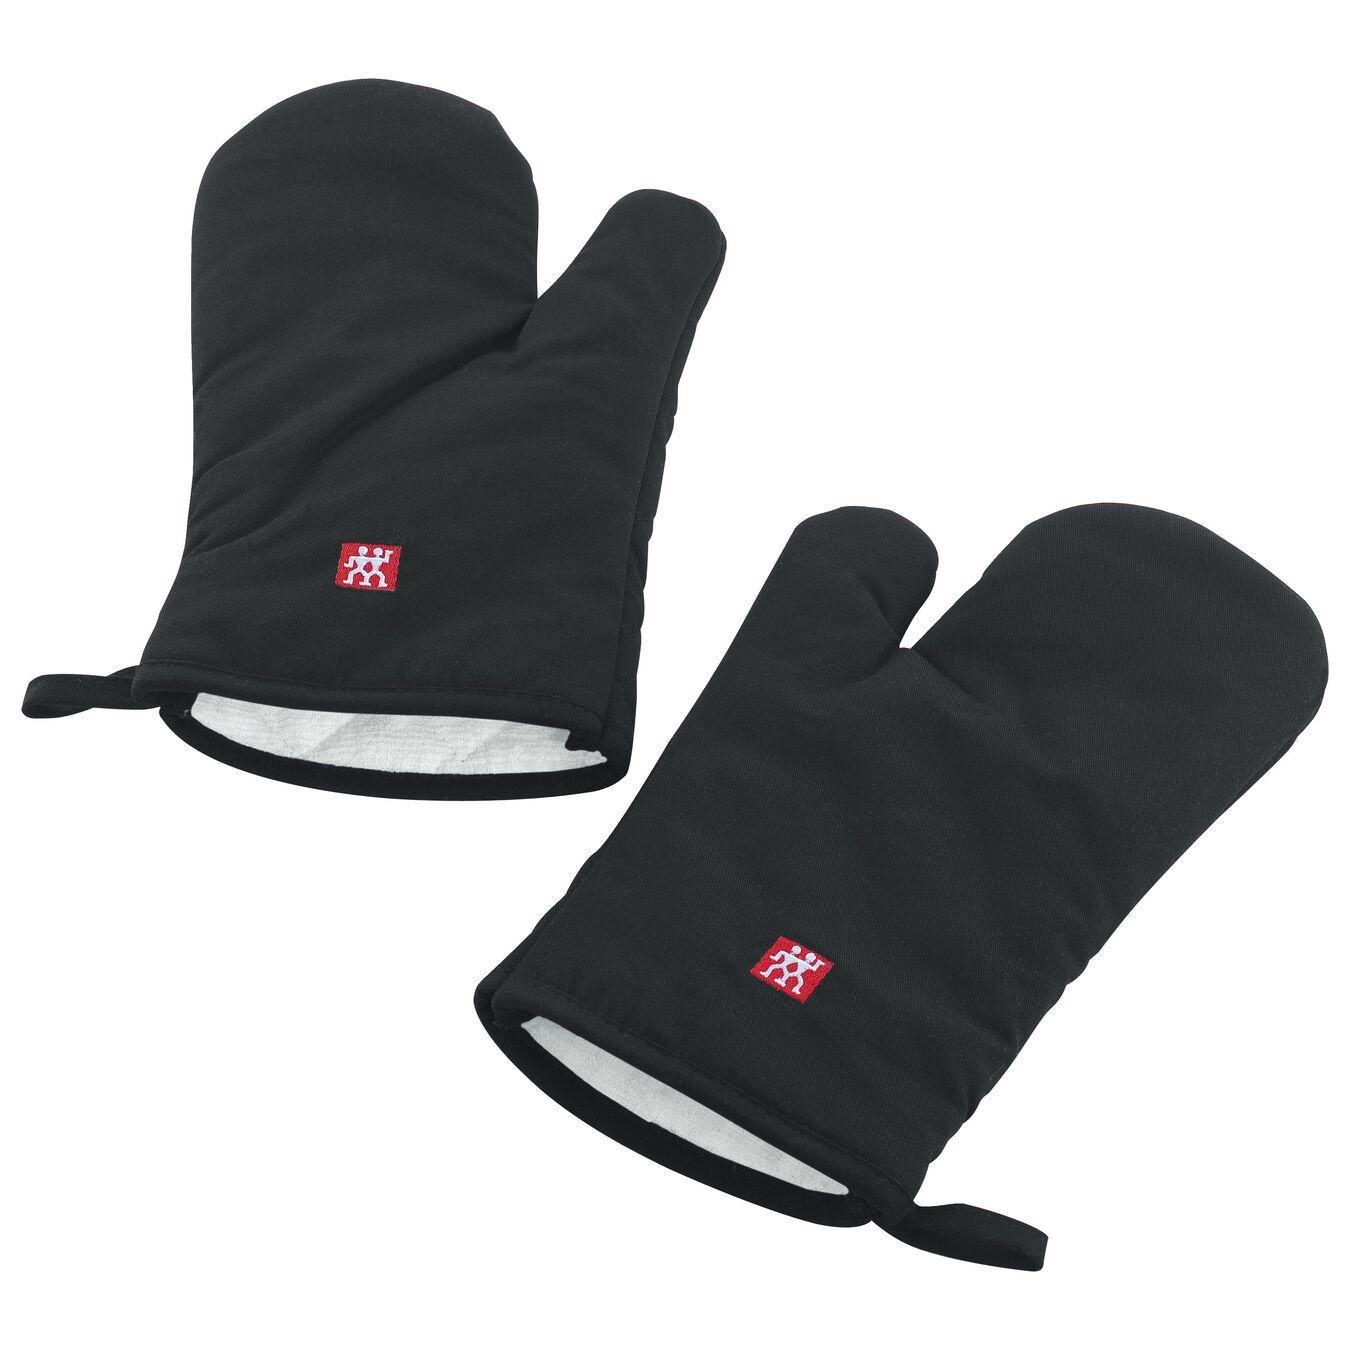 Oven glove set,,large 1